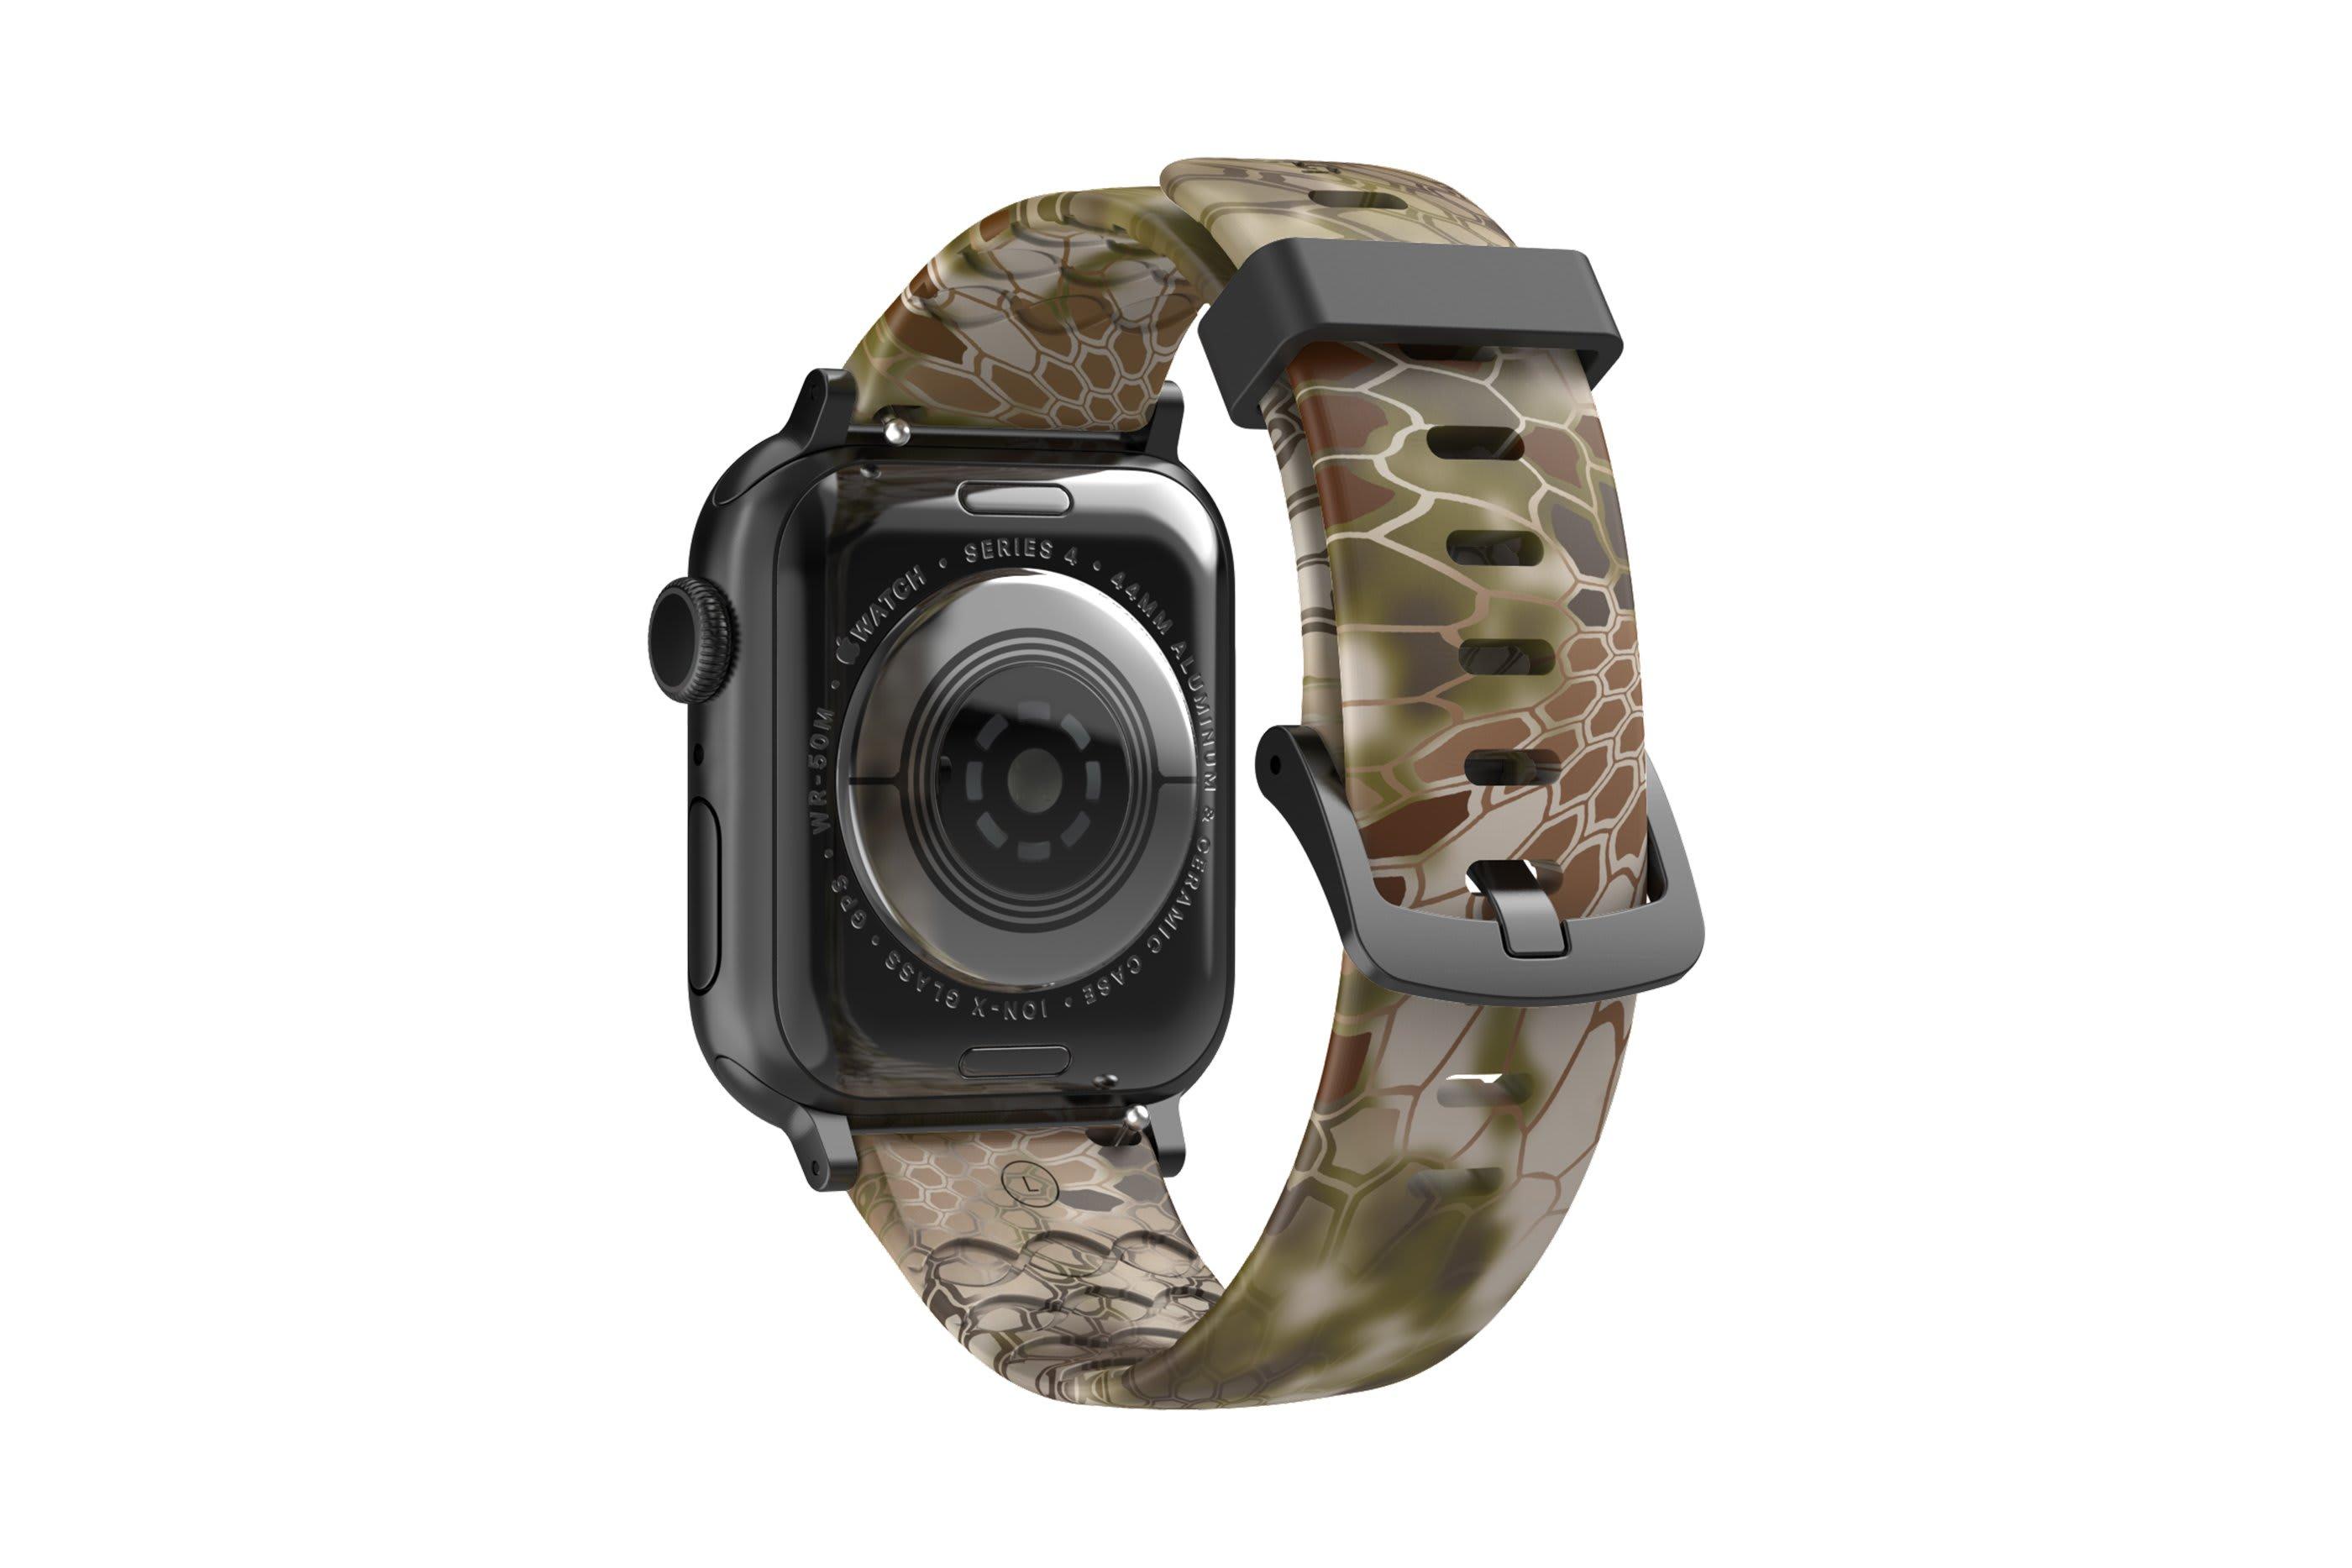 Kryptek Highlander Apple Watch Band with gray hardware viewed from rear